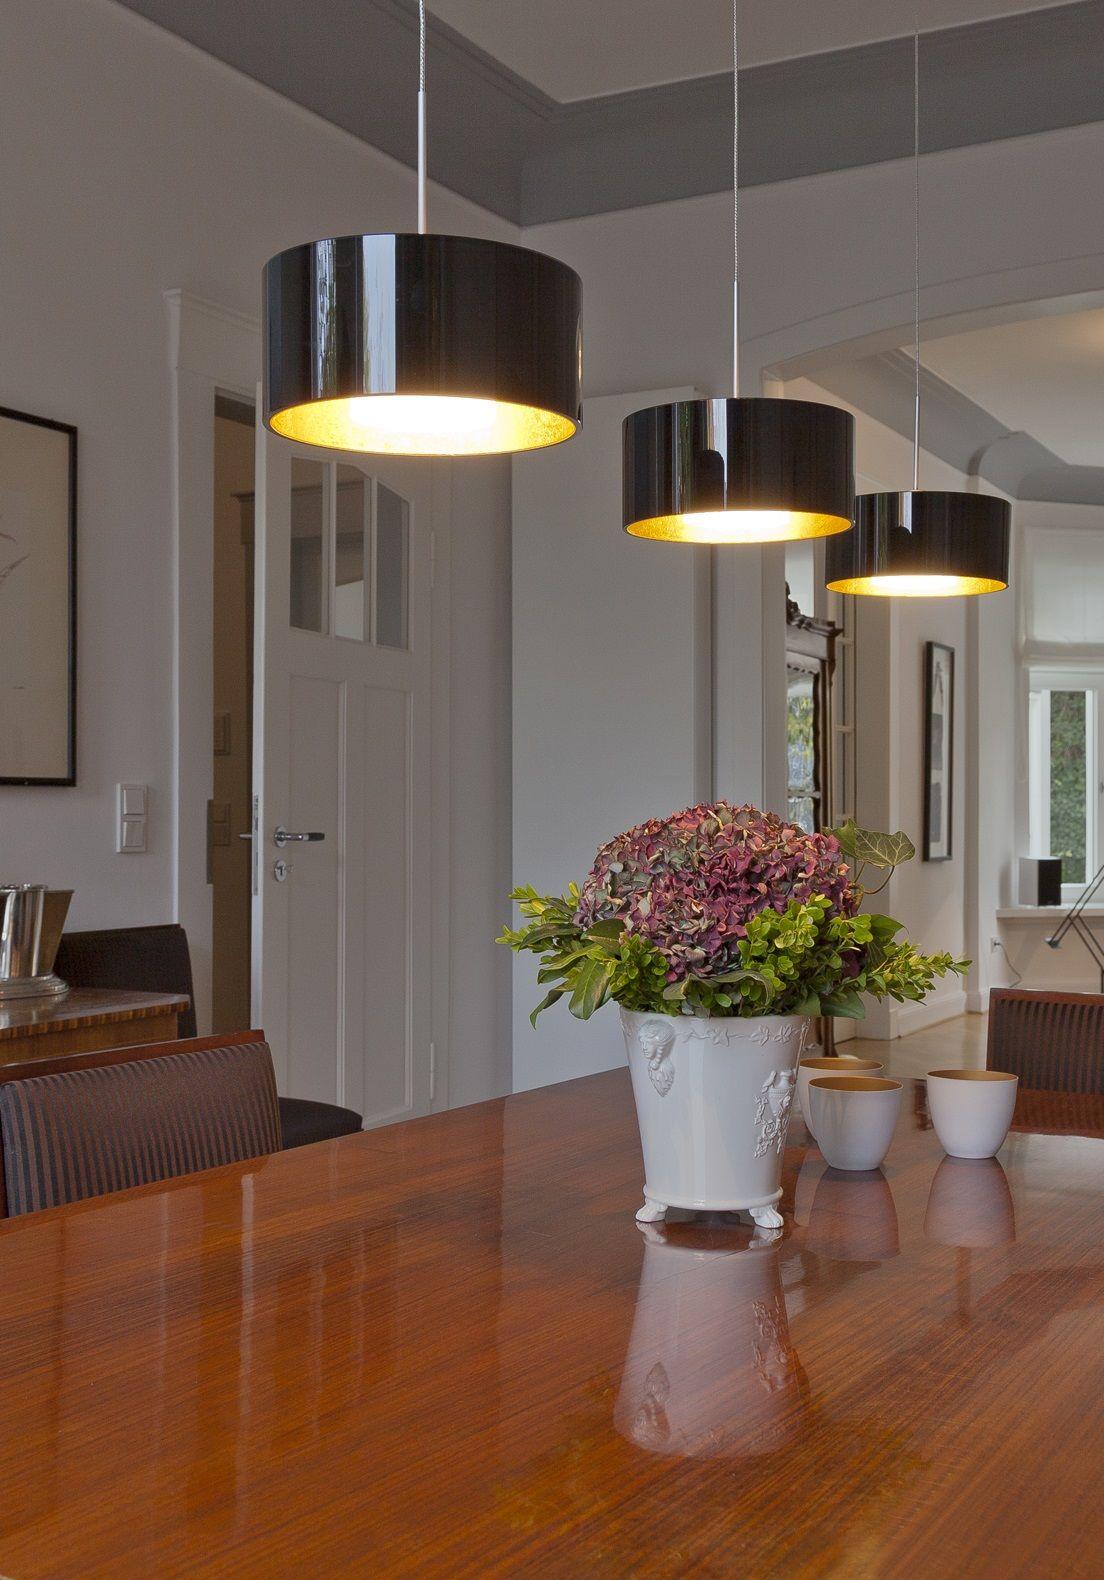 Wunderbar Rabatt Anhänger Beleuchtung Küche Zeitgenössisch - Ideen ...